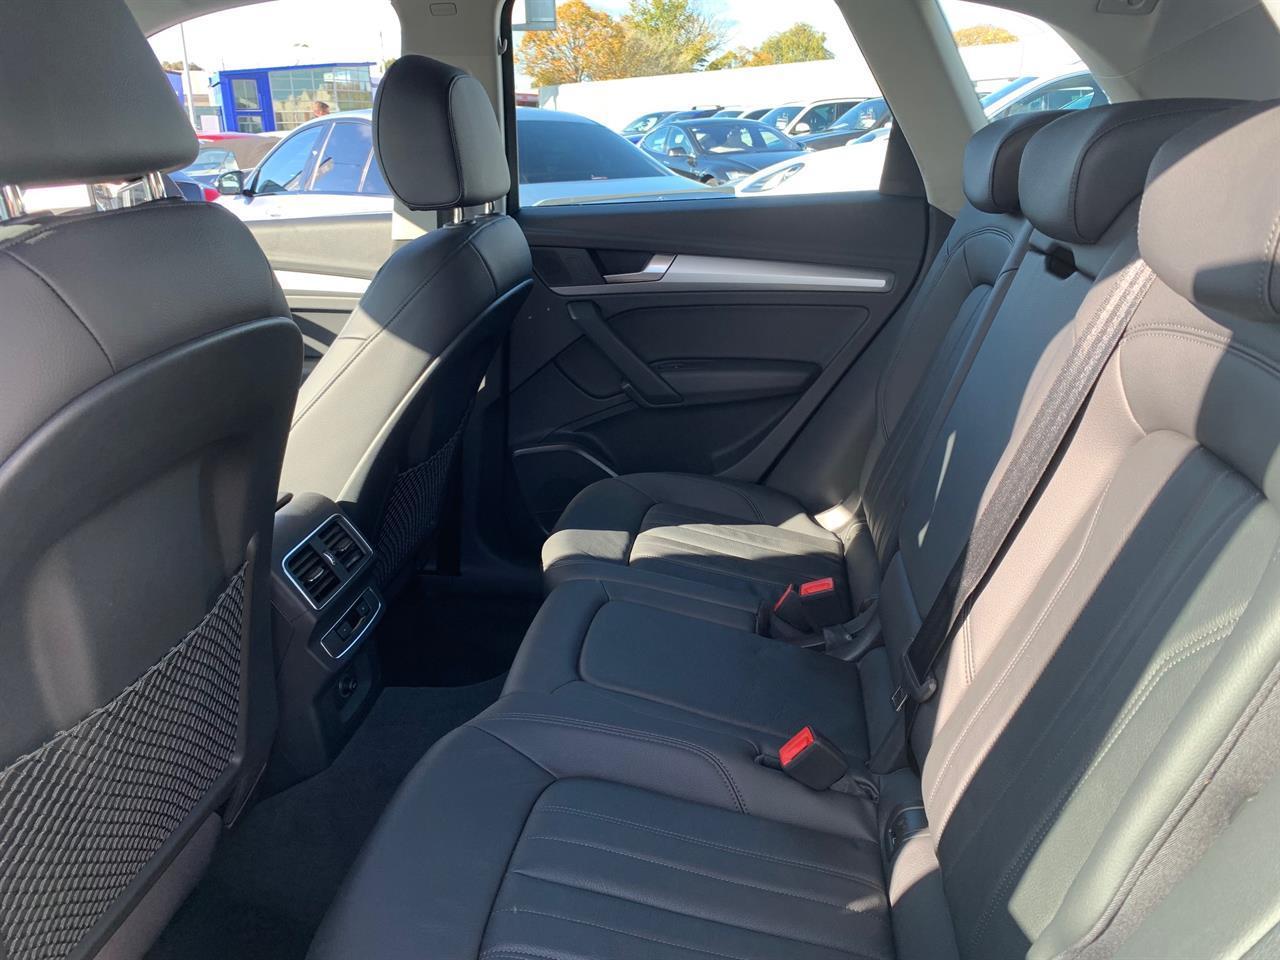 image-6, 2017 Audi Q5 2.0T FSI New Model Quattro at Christchurch